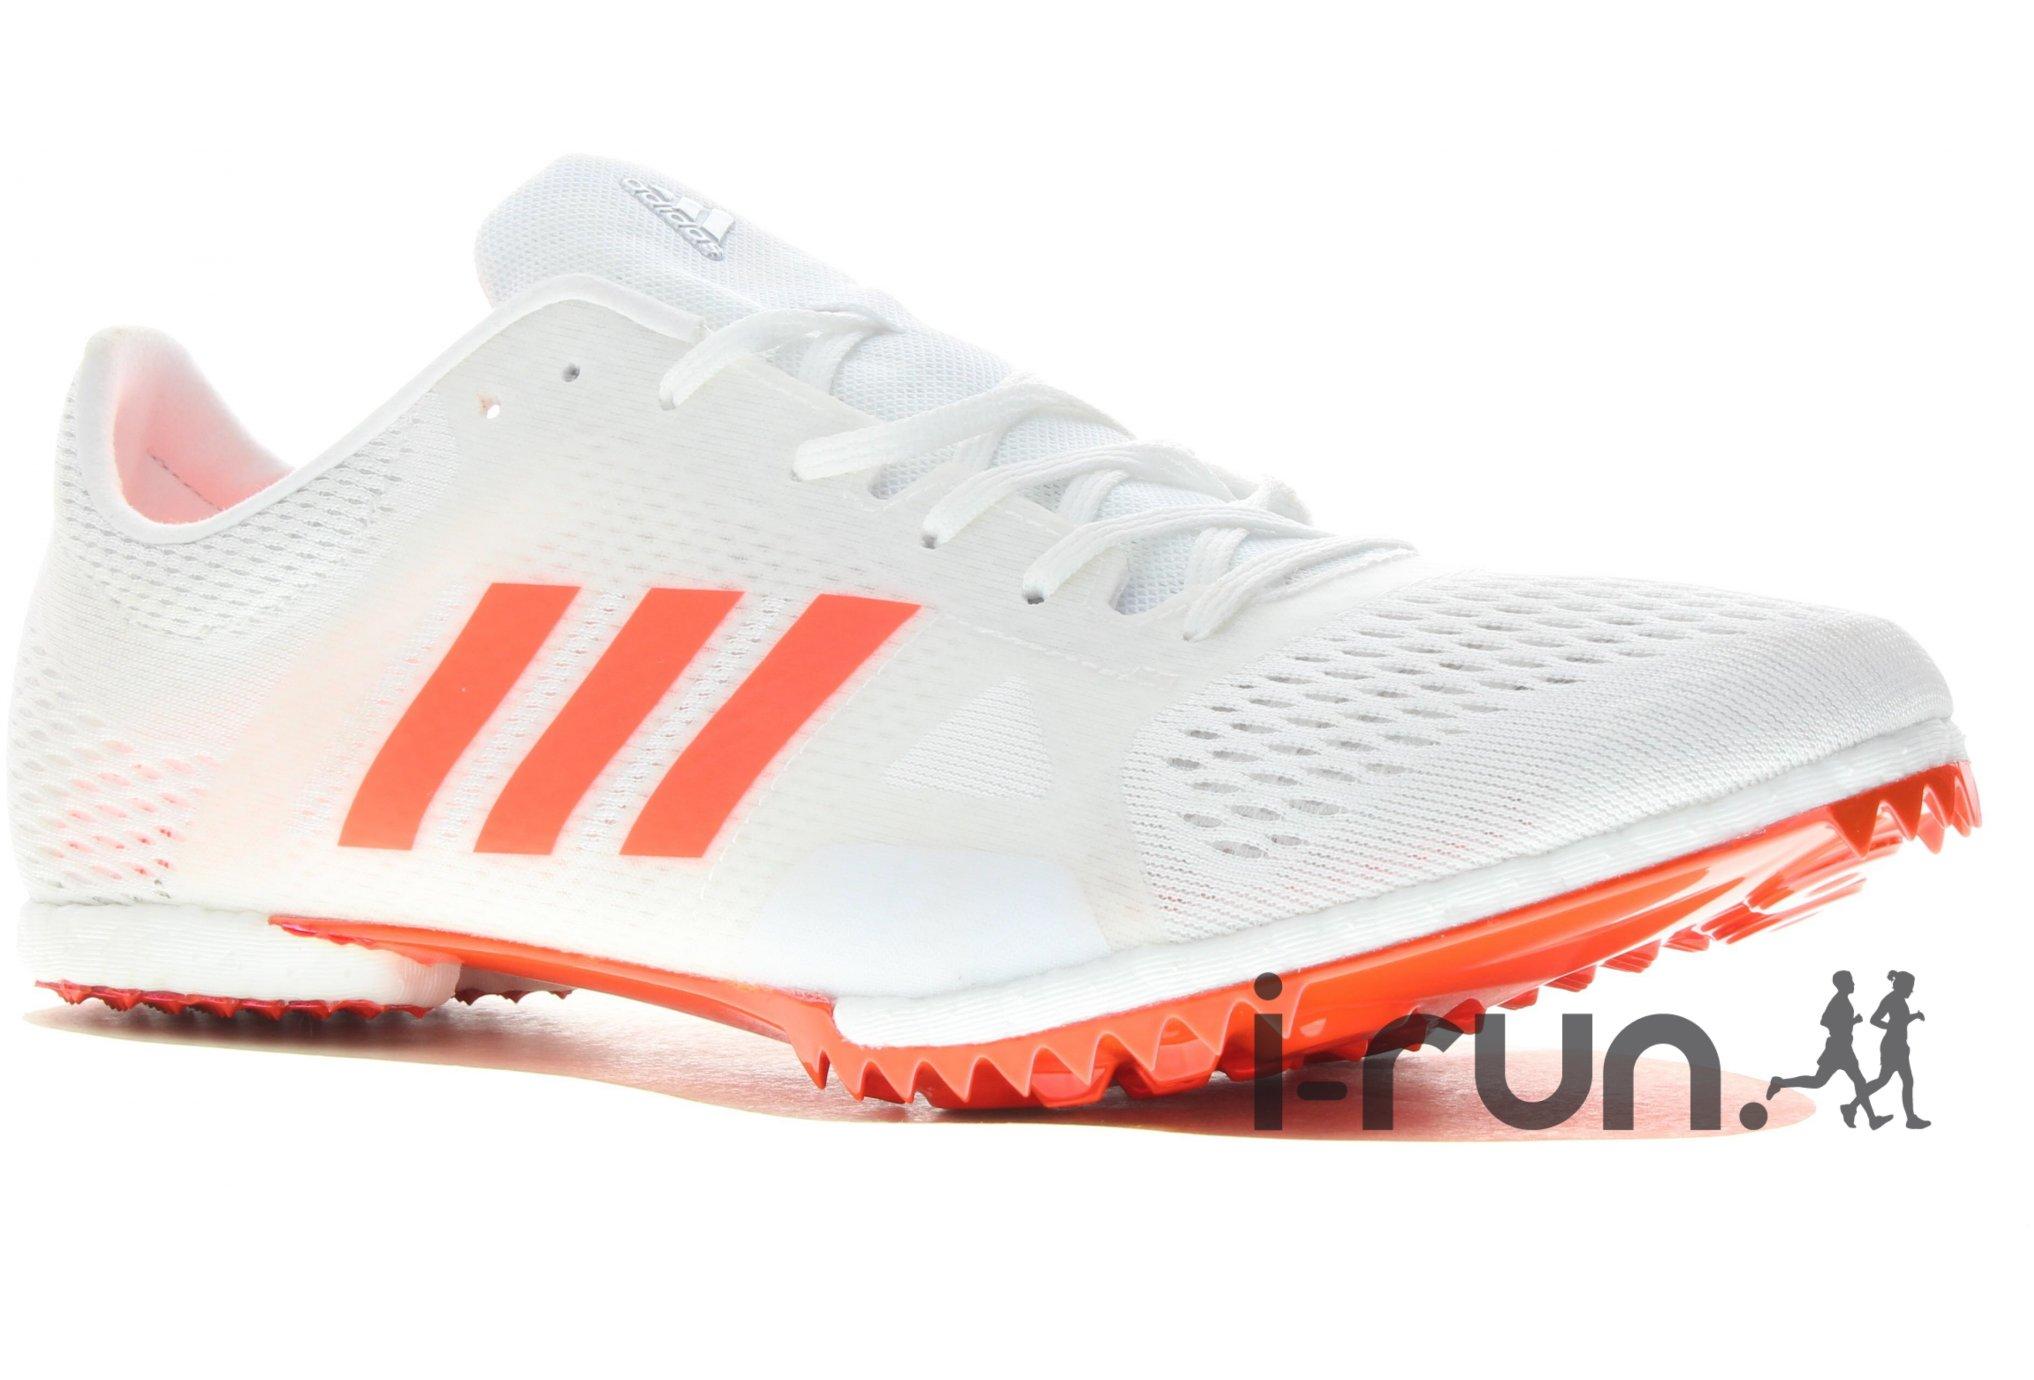 Adidas Adizero md m chaussures homme